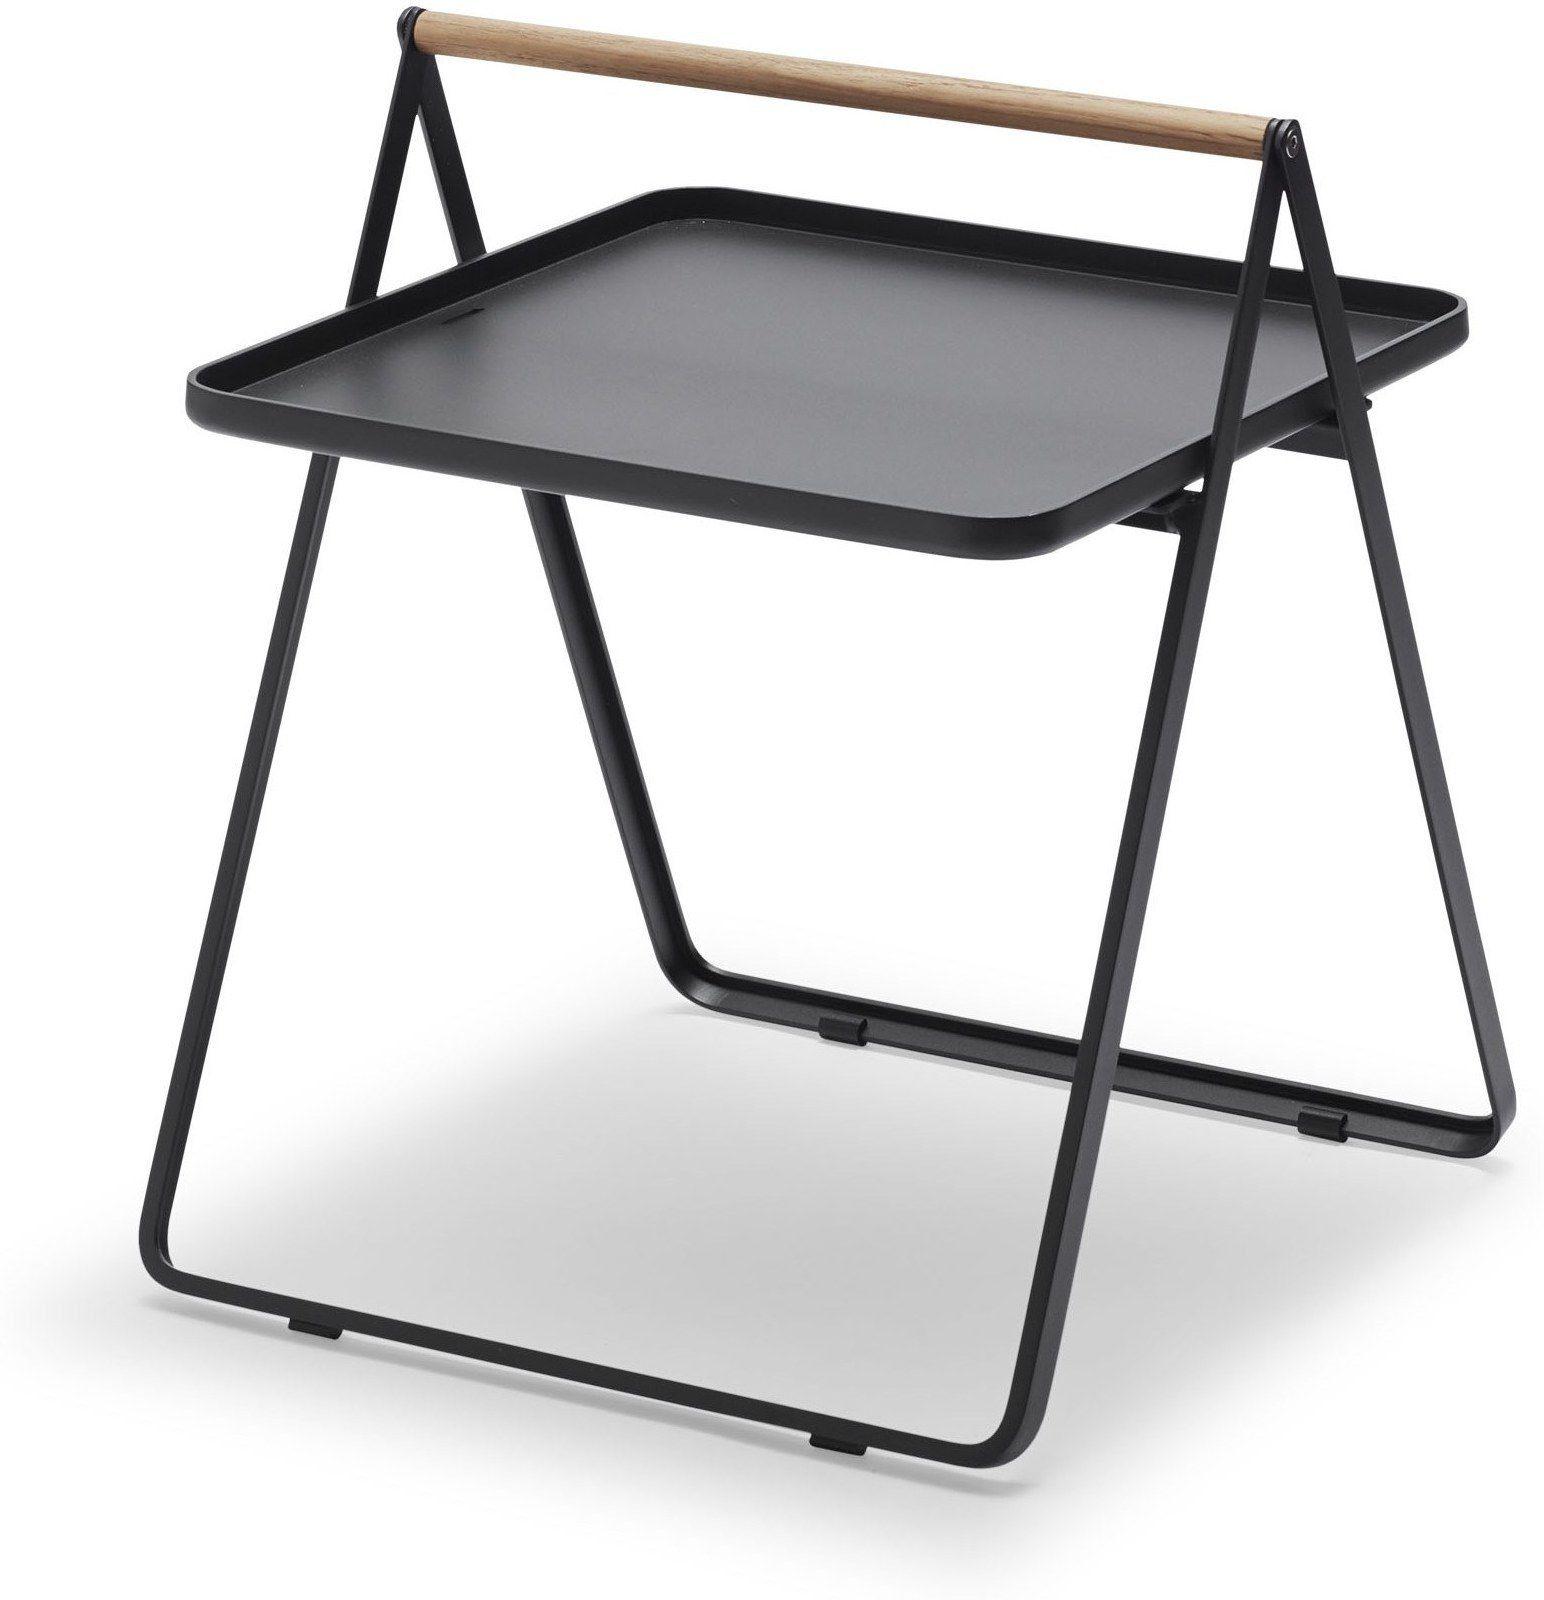 Stolik Szklany Olx Lawy Stoliki Kawowe Bialy Stolik Kawowy Agata Meble Maly Stolik Do Kawy Stoliki Kaw Side Coffee Table Diy Furniture Table Side Table